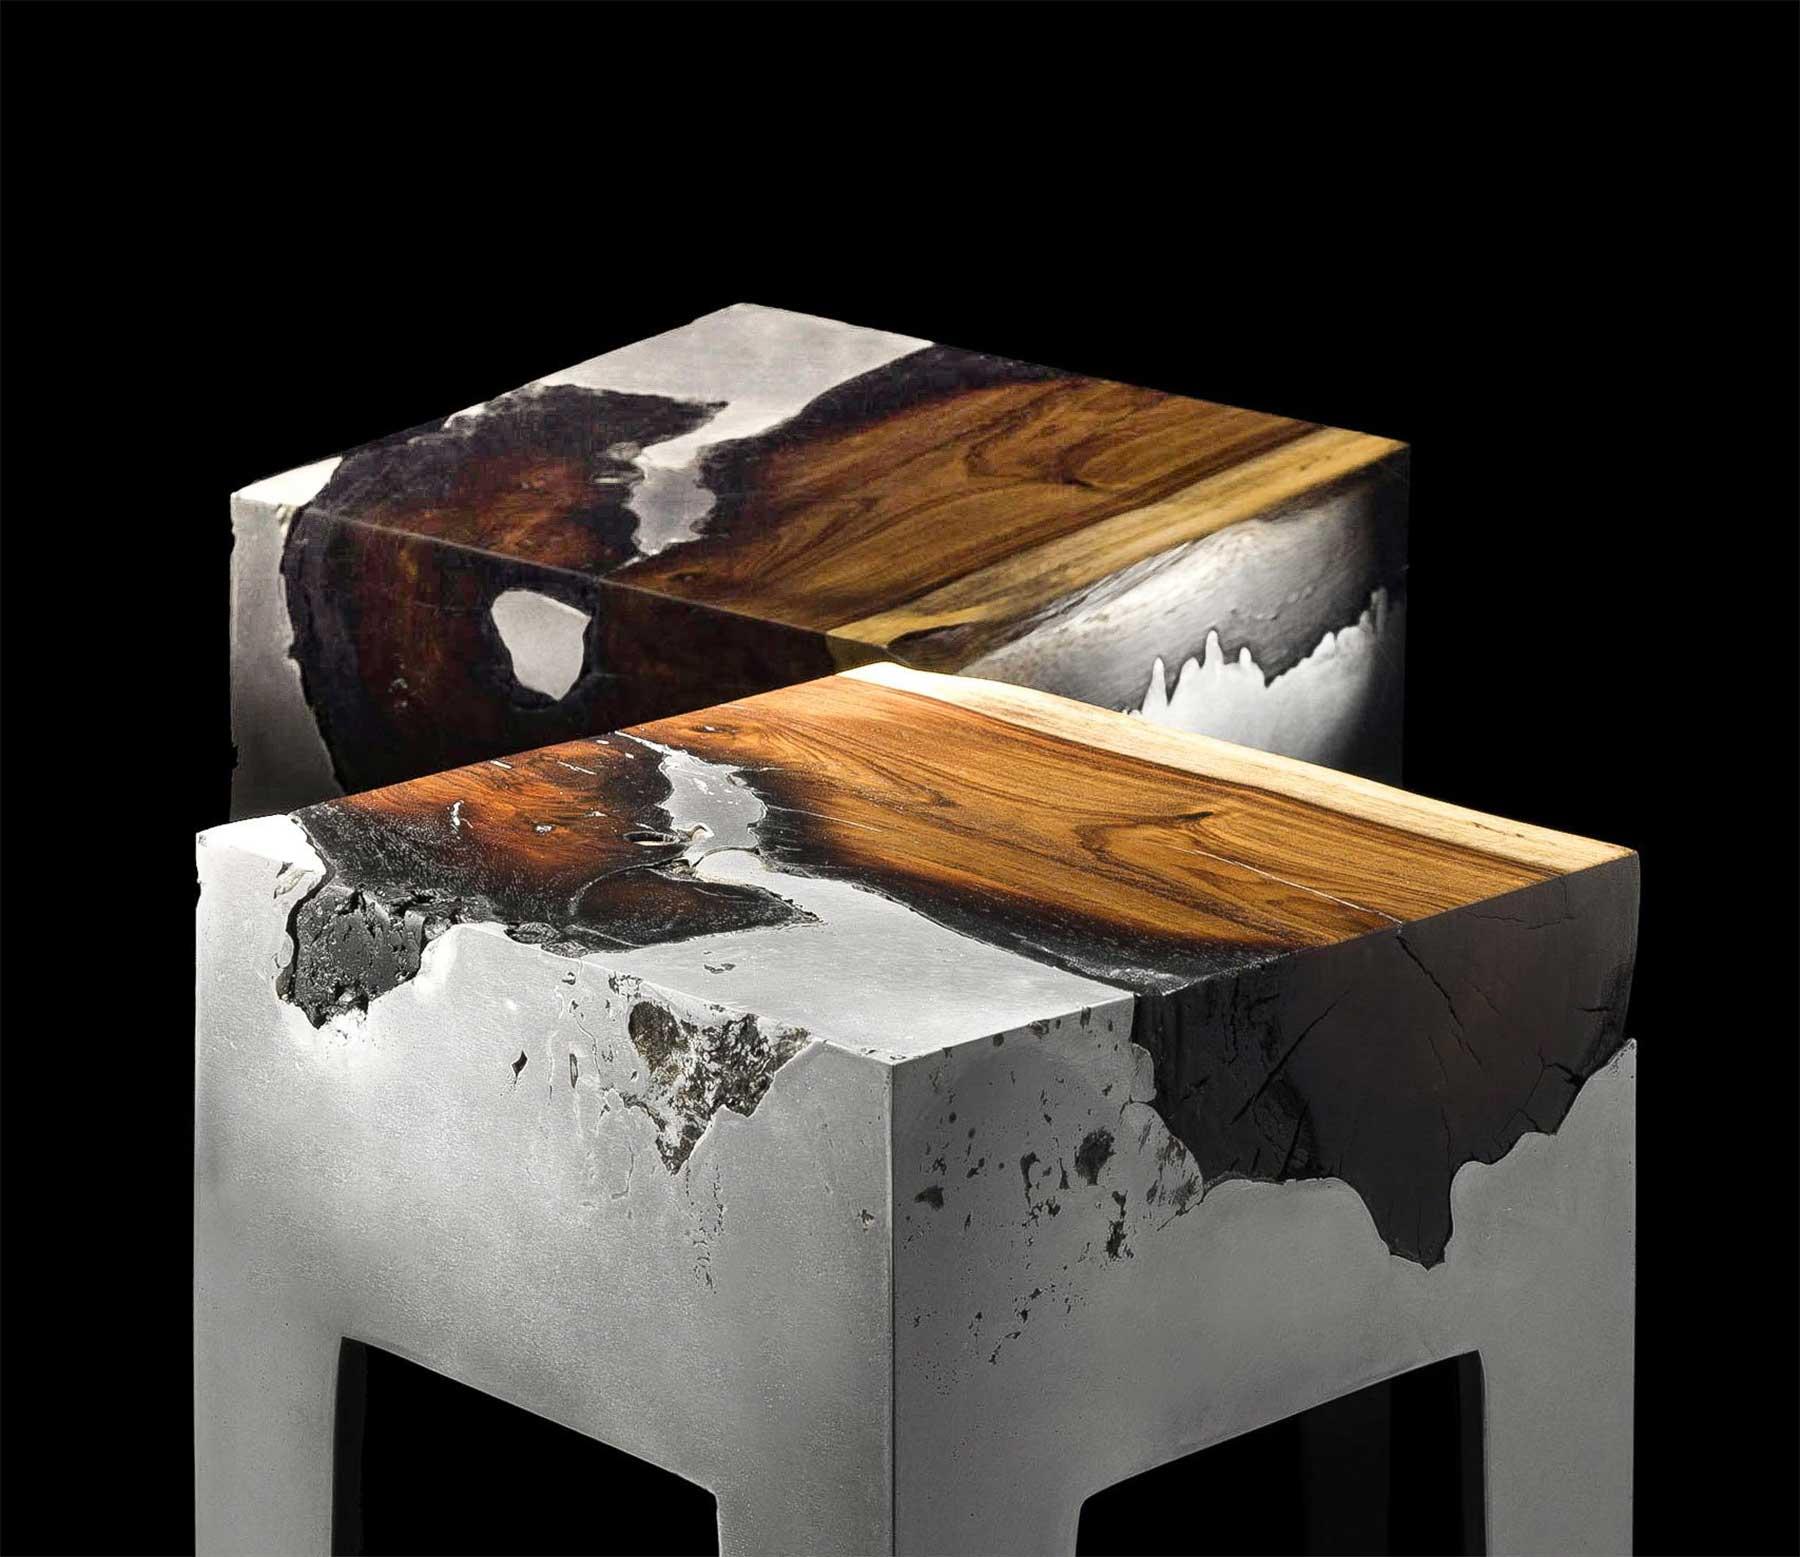 Aluminium-Holz-Möbel von Hilla Shamia